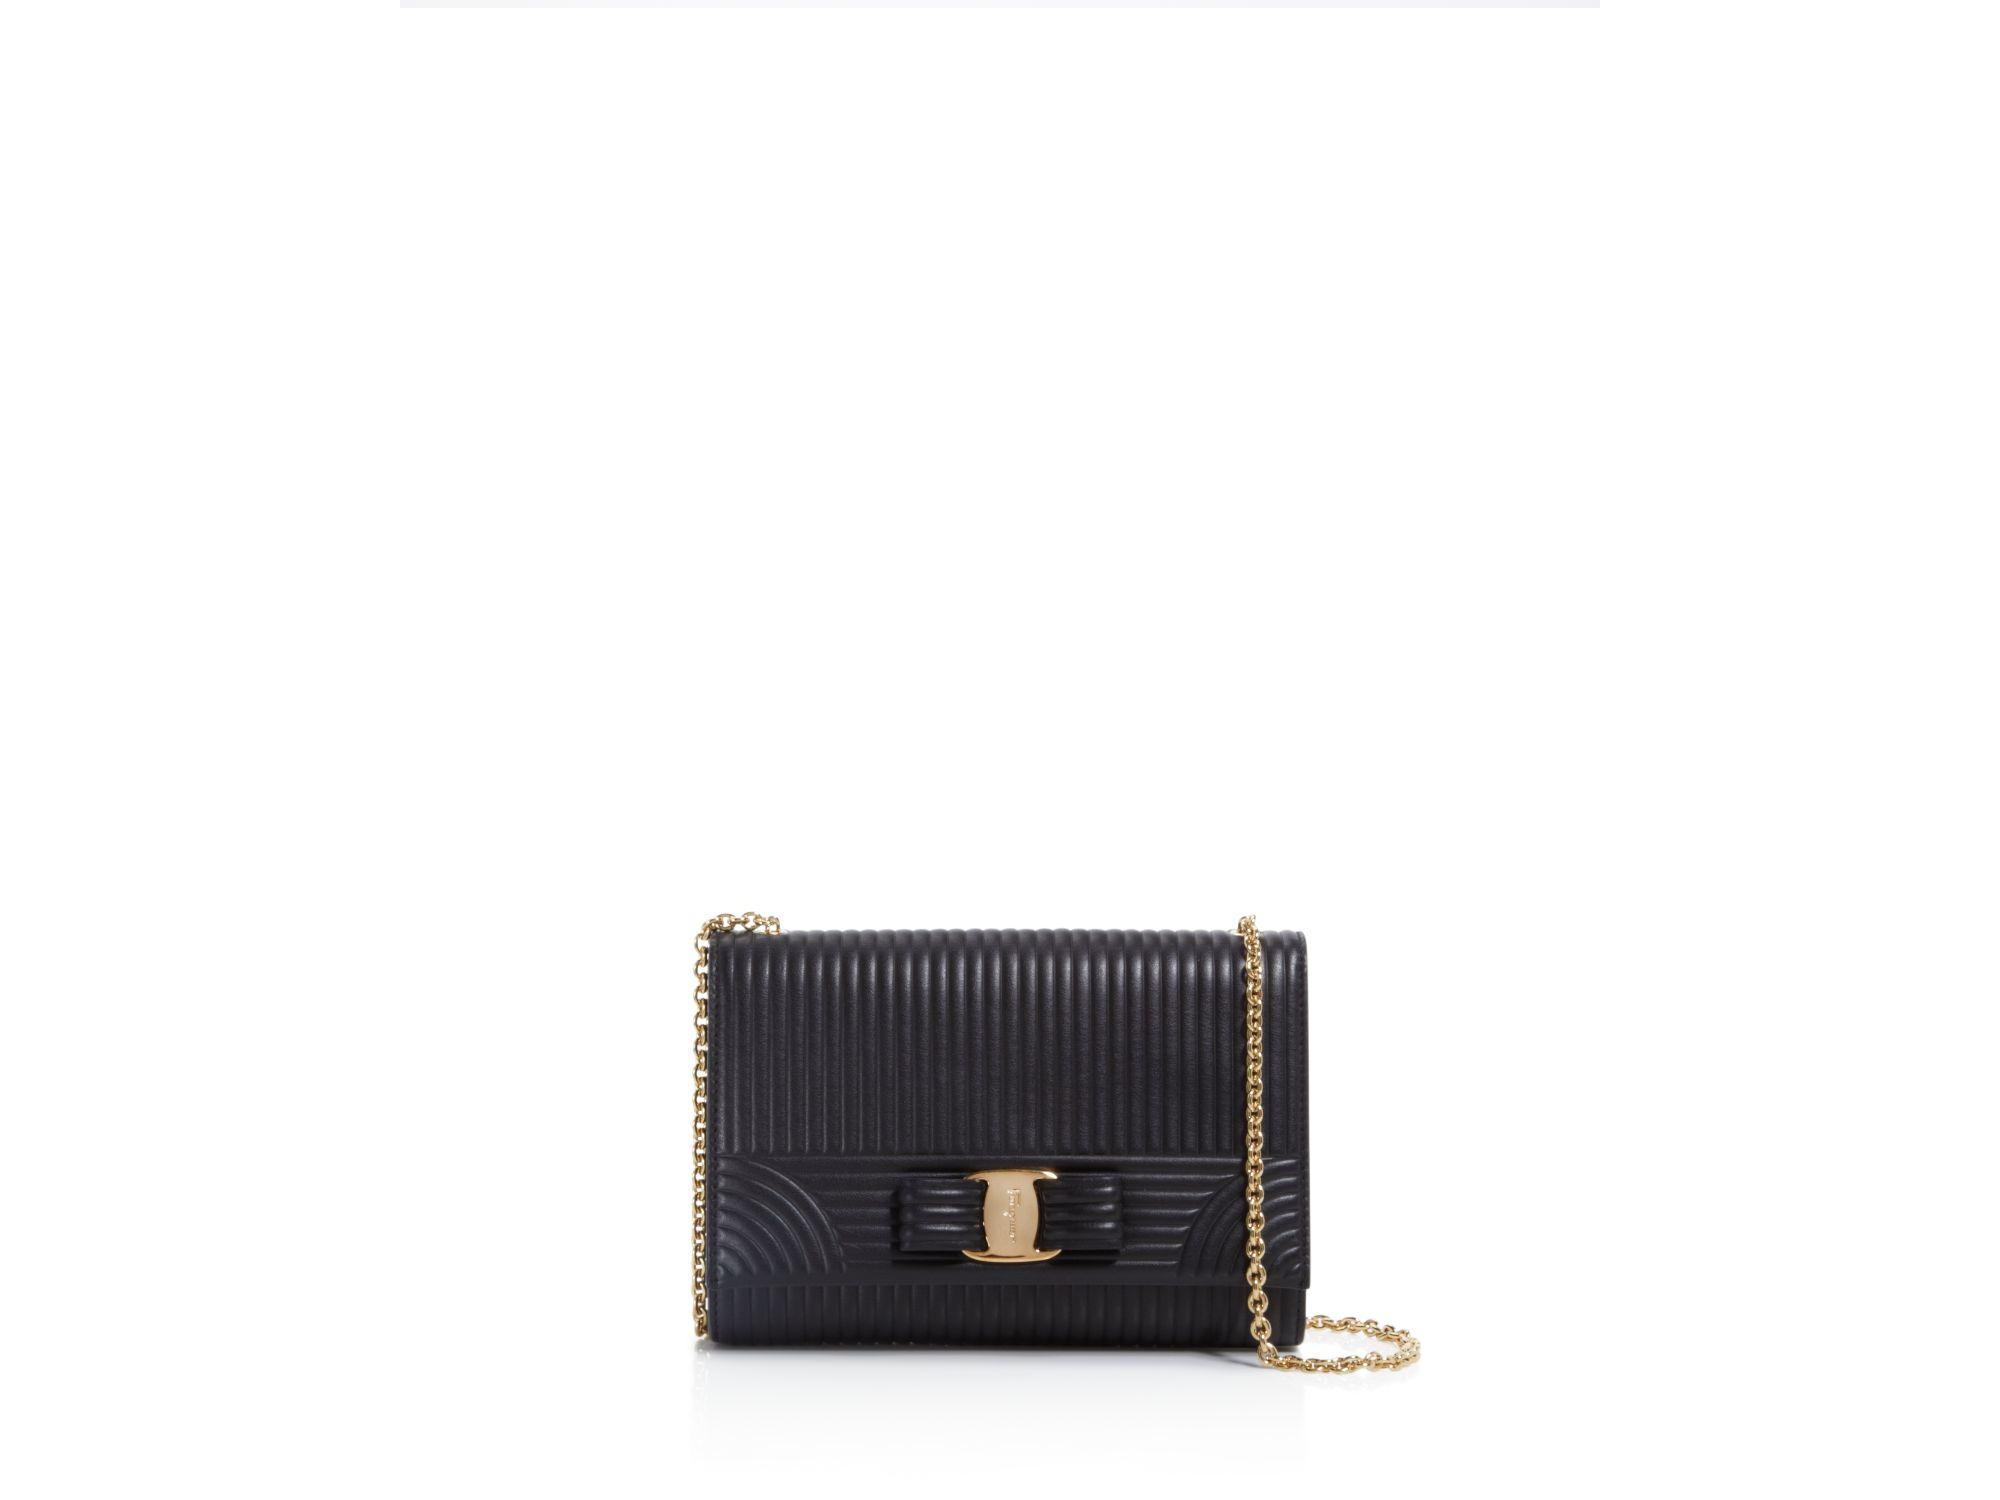 b1e5638f85b1 Lyst - Ferragamo Vara Wave Mini Bag in Black